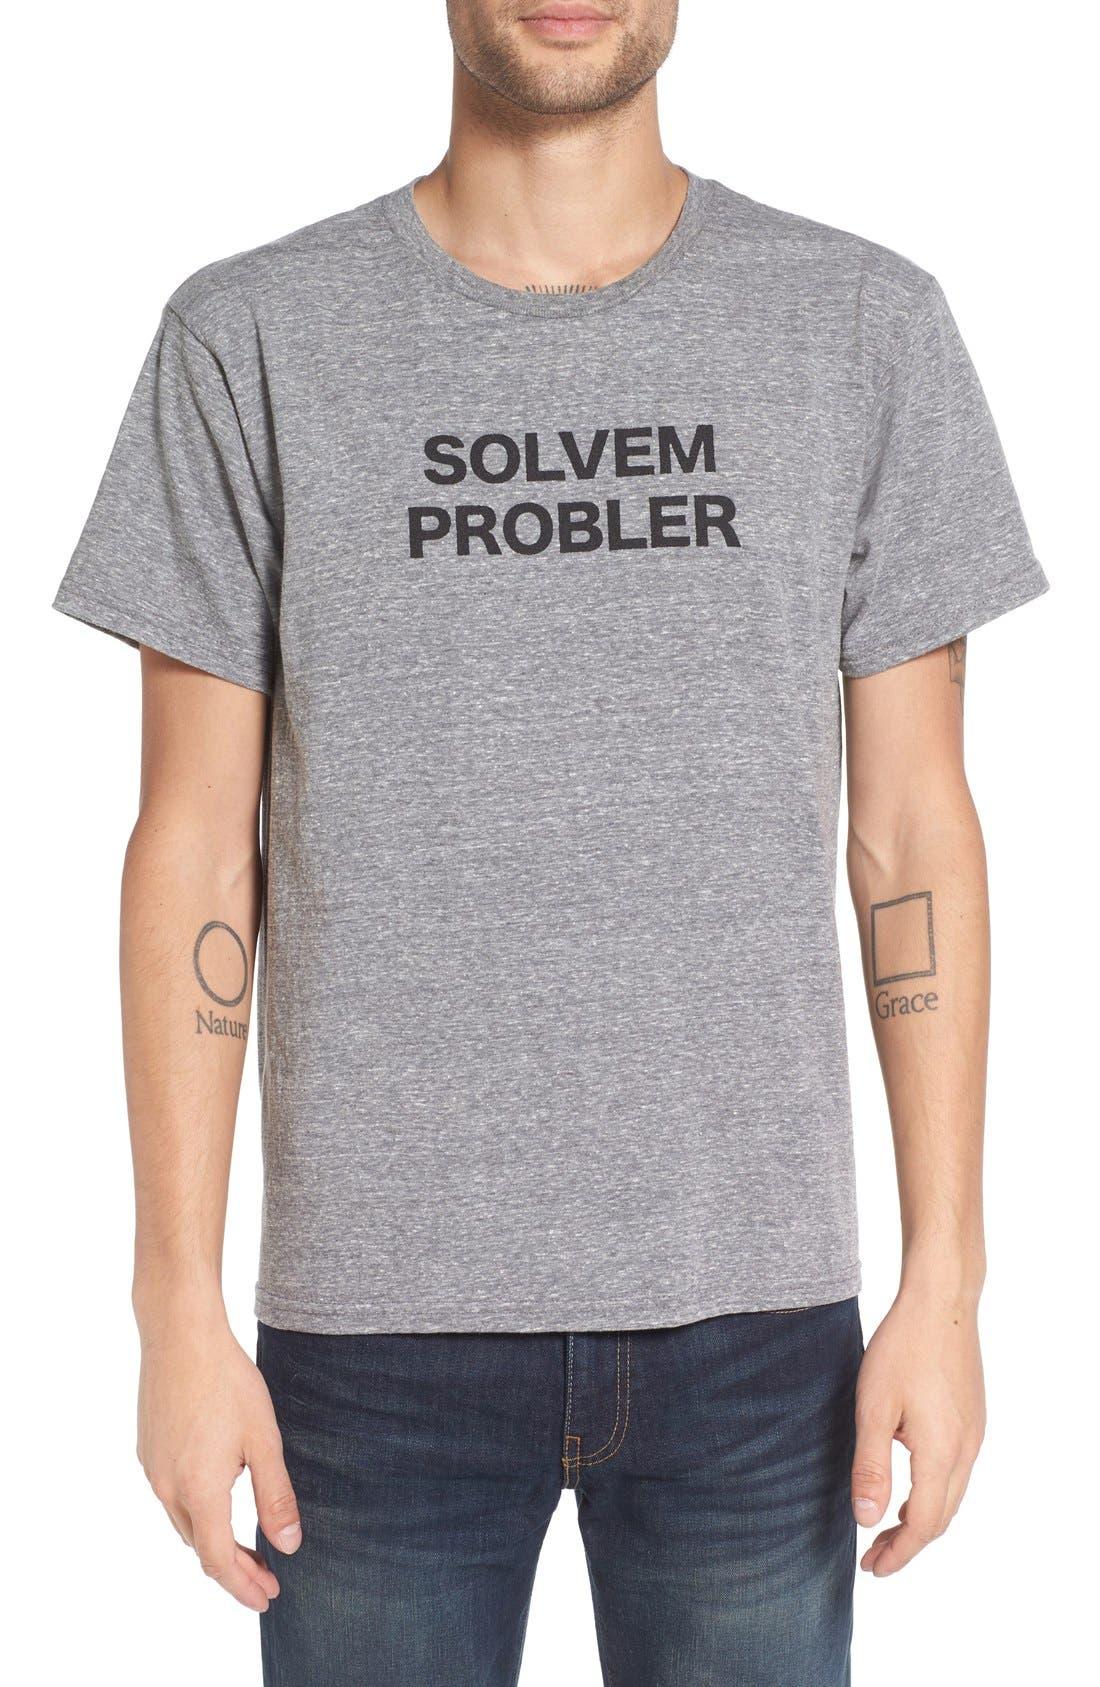 Altru Solvem Probler Graphic T-Shirt